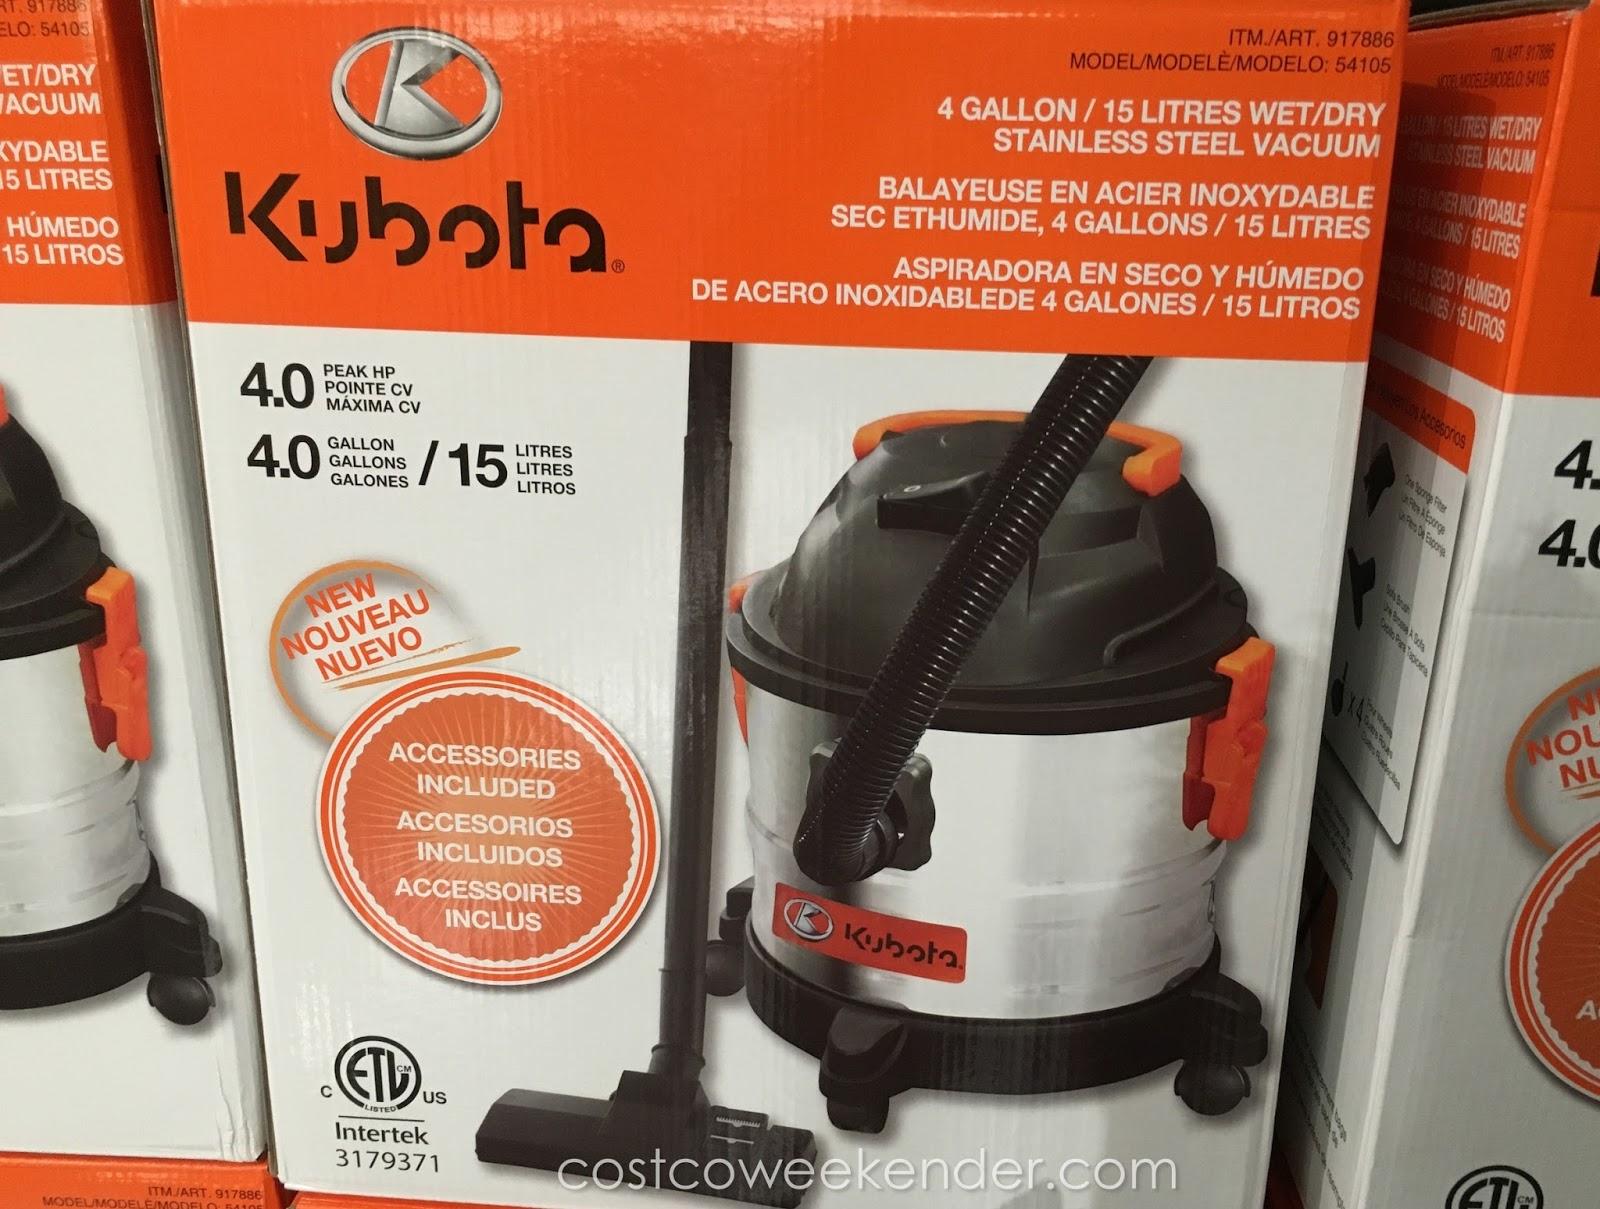 Kuboto Wet Dry Stainless Steel Vacuum Model 54105